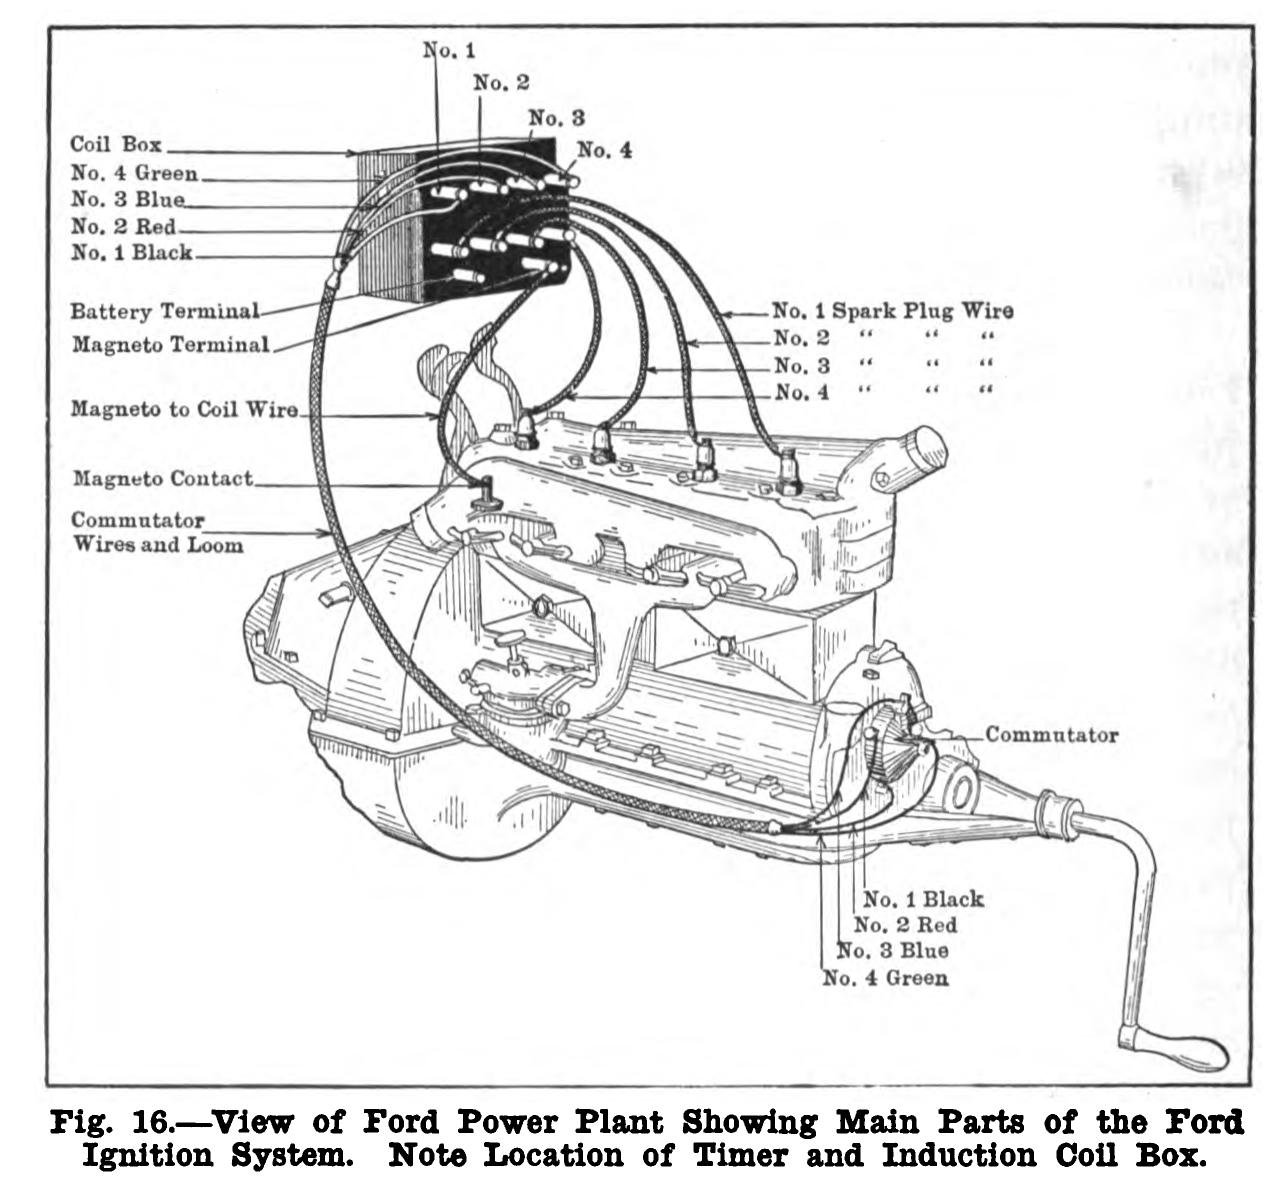 1917 model t ford car figure 16 [ 1284 x 1200 Pixel ]